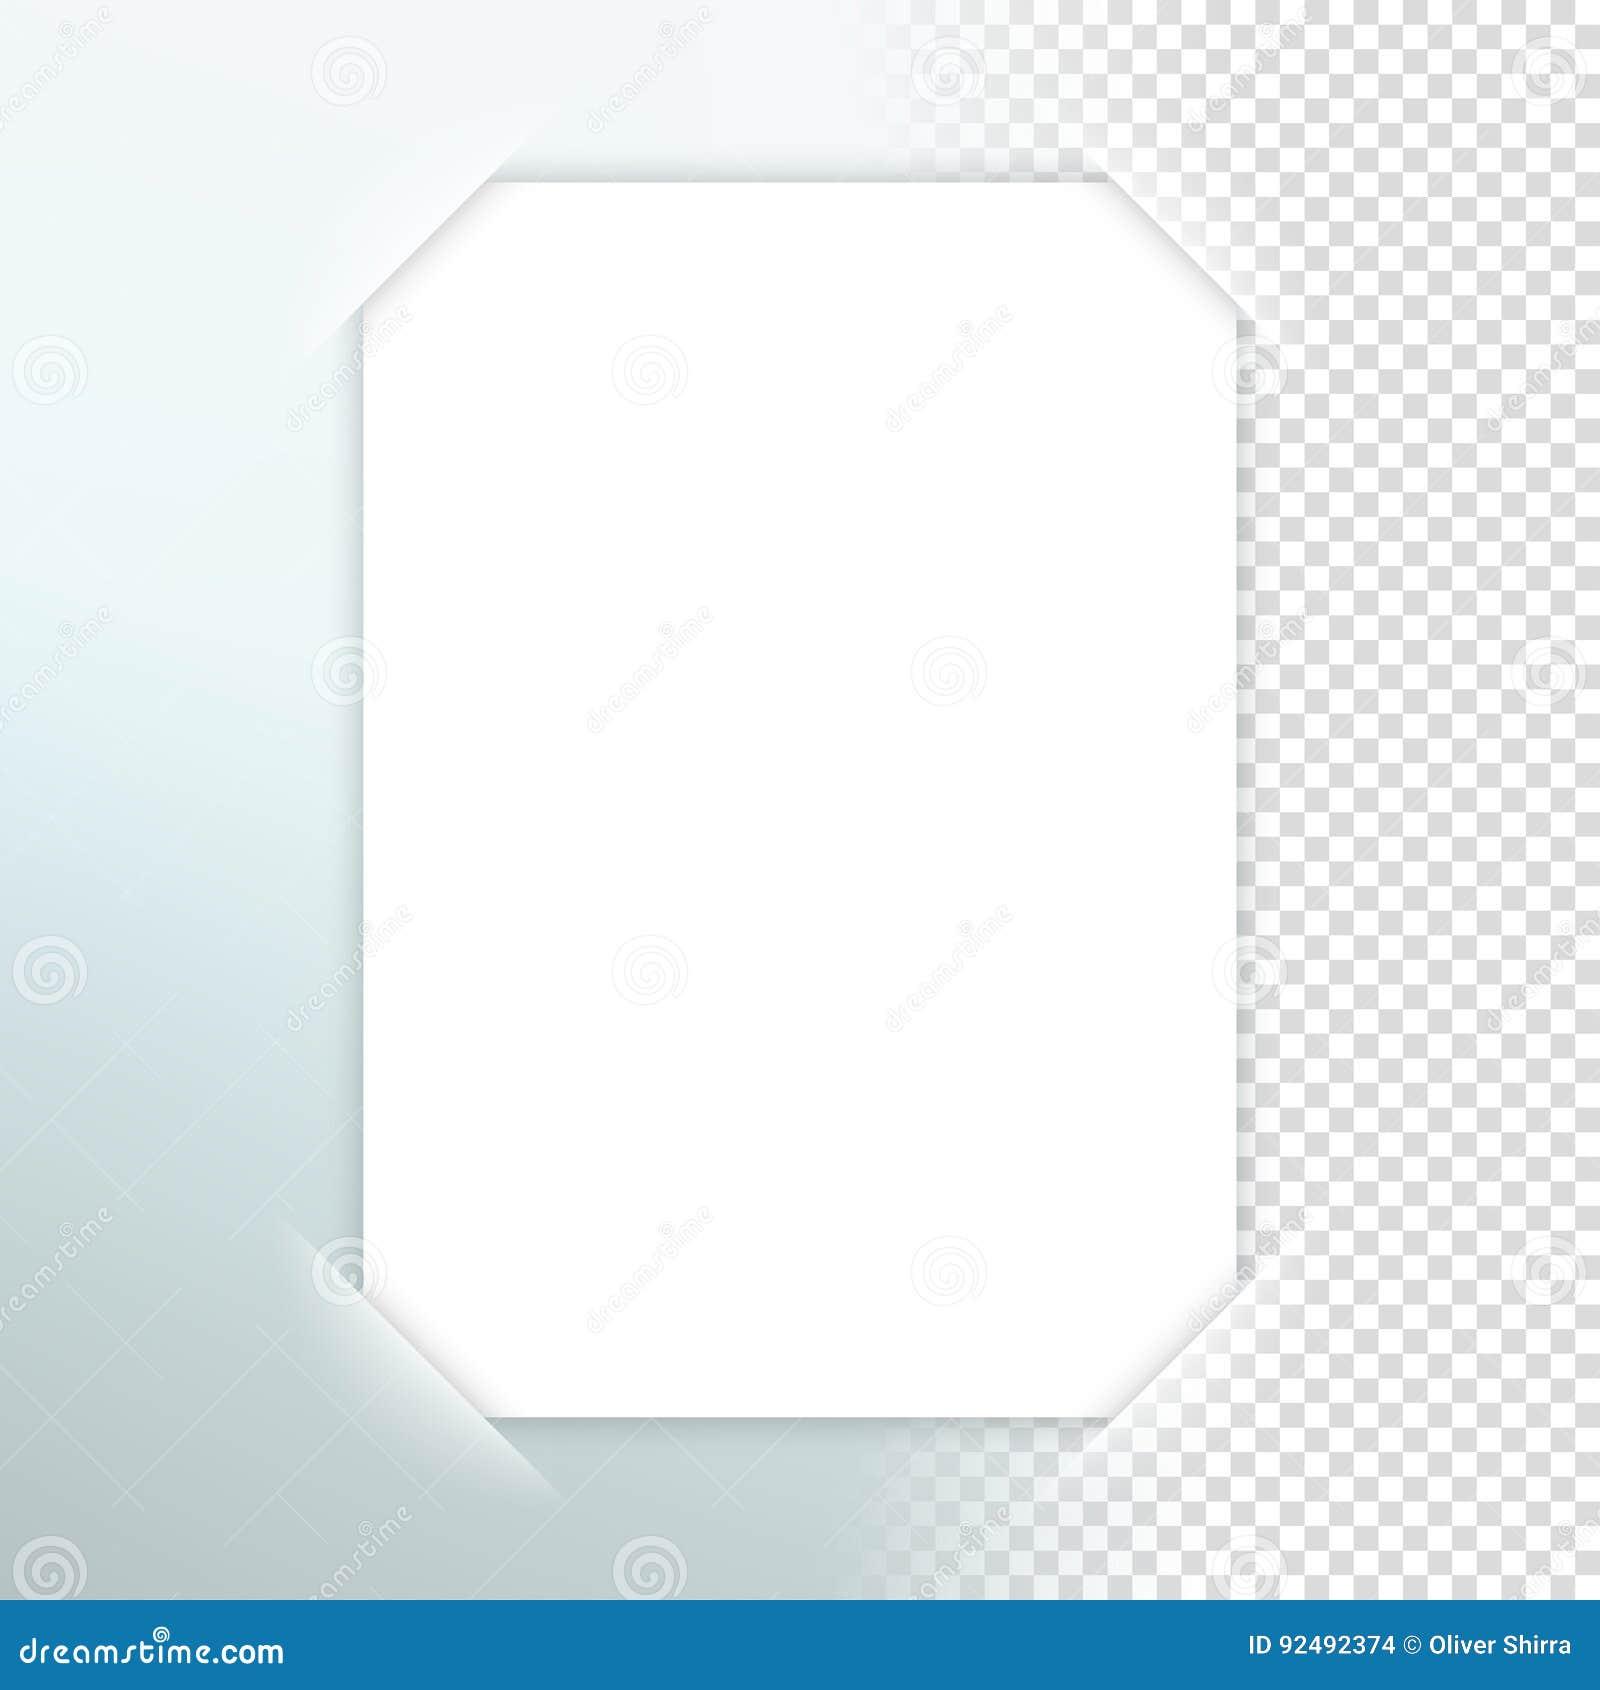 Vektor-Papierrahmen Mit Transparentem Schatten Vektor Abbildung ...